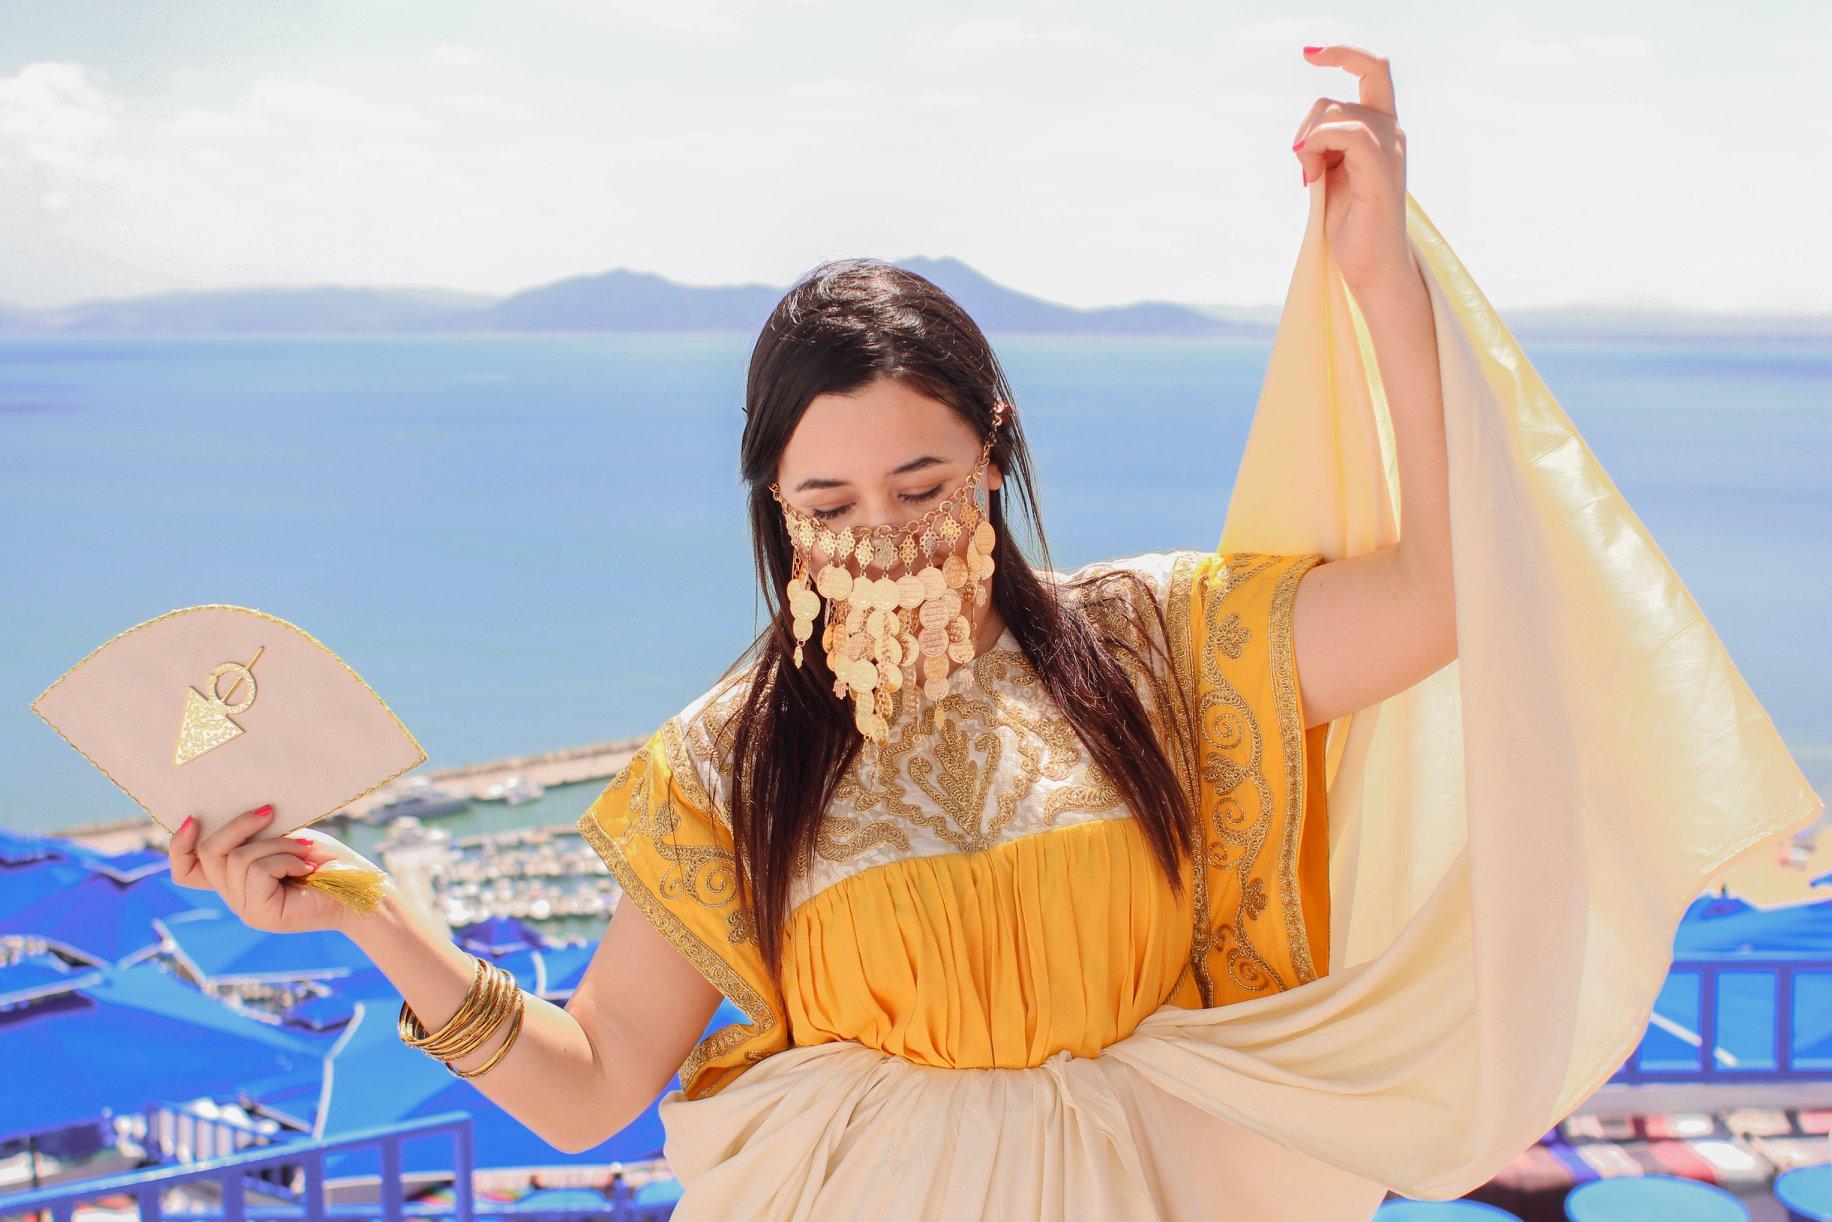 rahma3_plus_belles_mariées_tunisiennes_190_2019